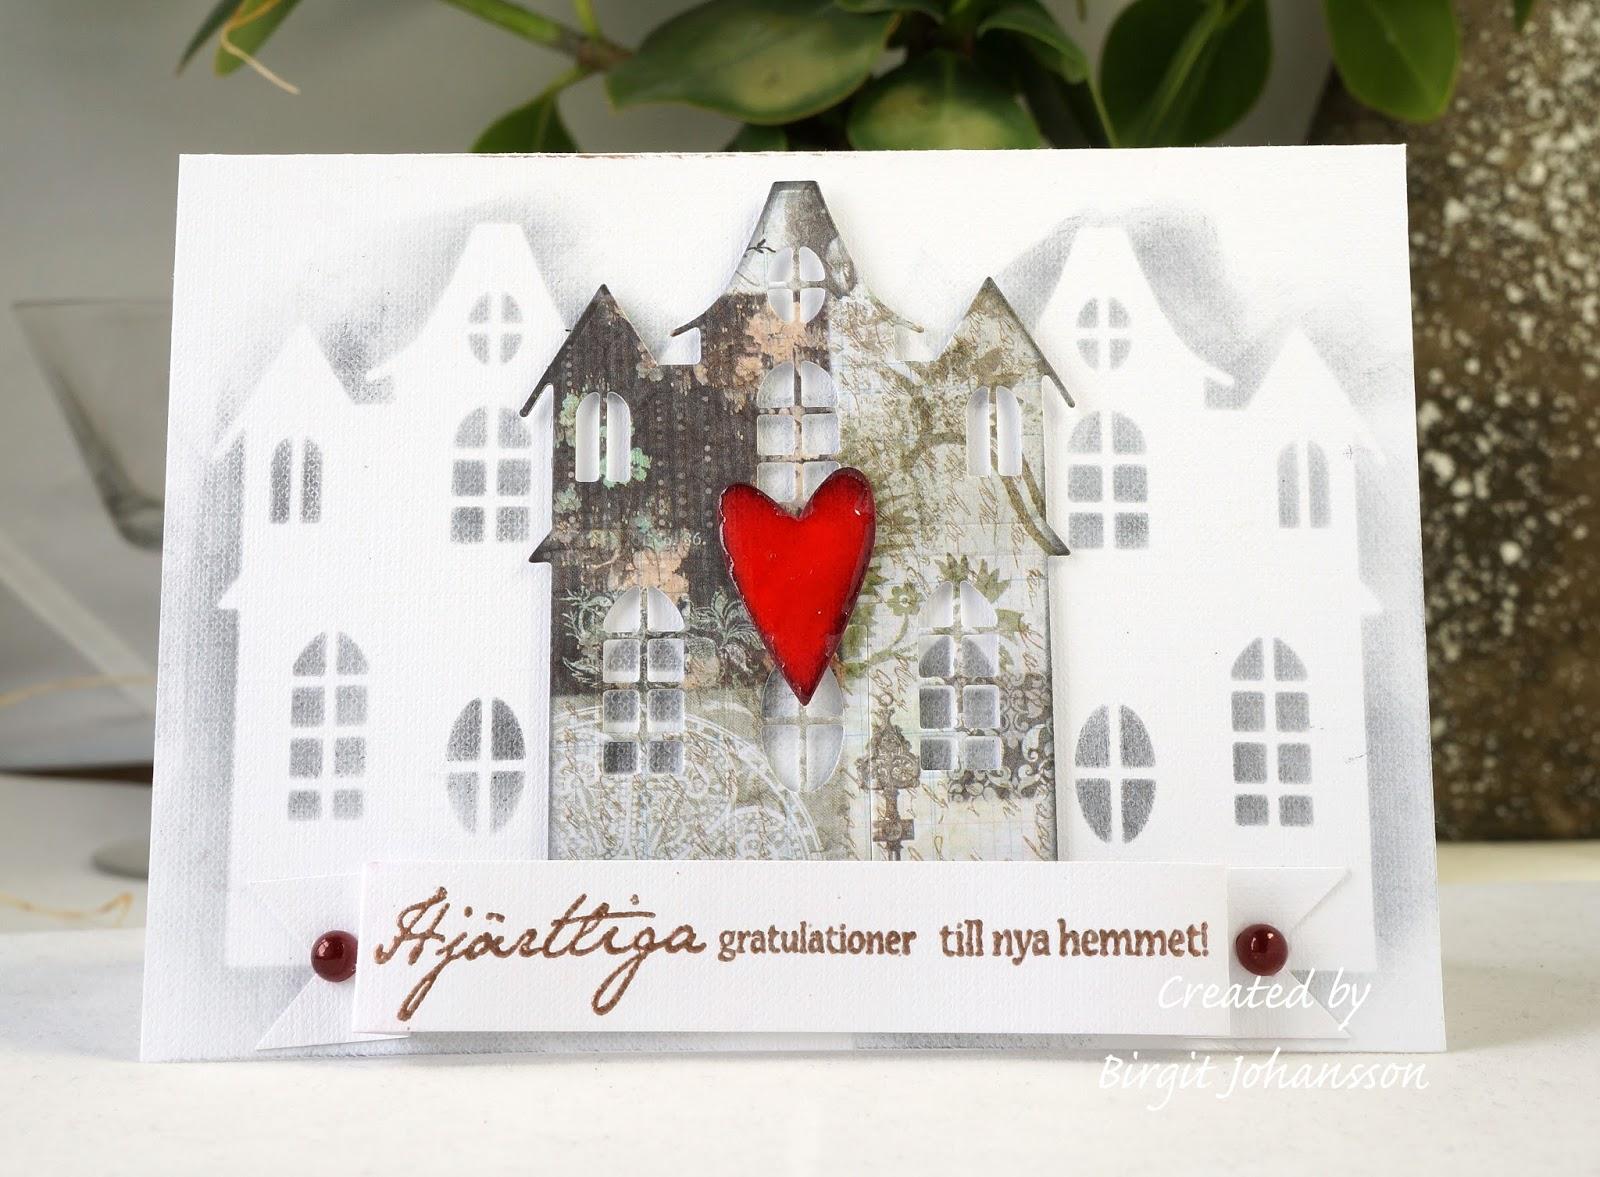 Cards R Fun Heartfelt Congratulations To The New Home